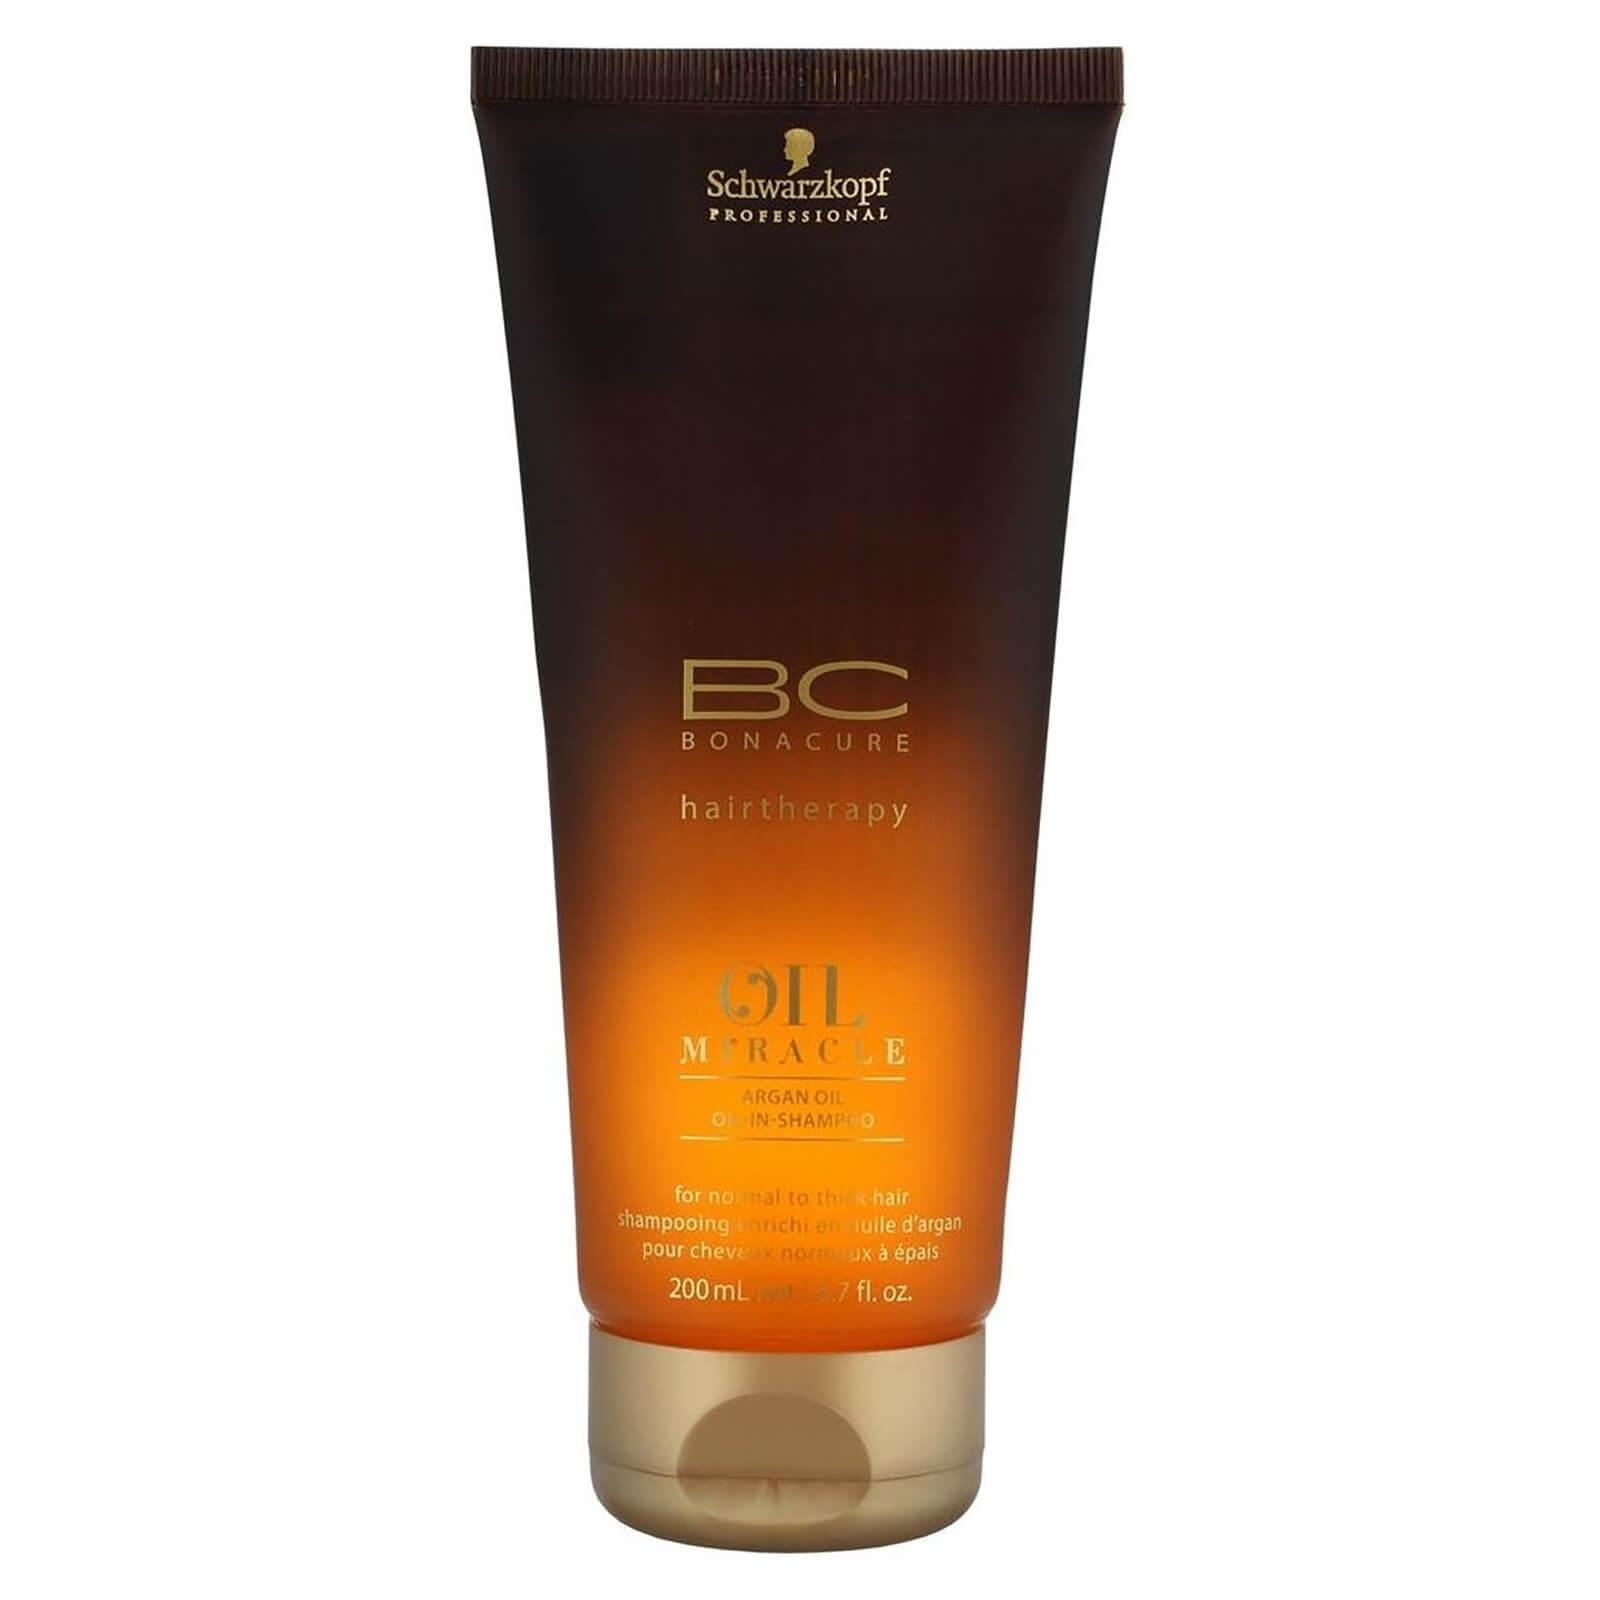 e1ea55aaaf Schwarzkopf BC Oil Miracle Shampoo (200ml) | Free Shipping | Lookfantastic